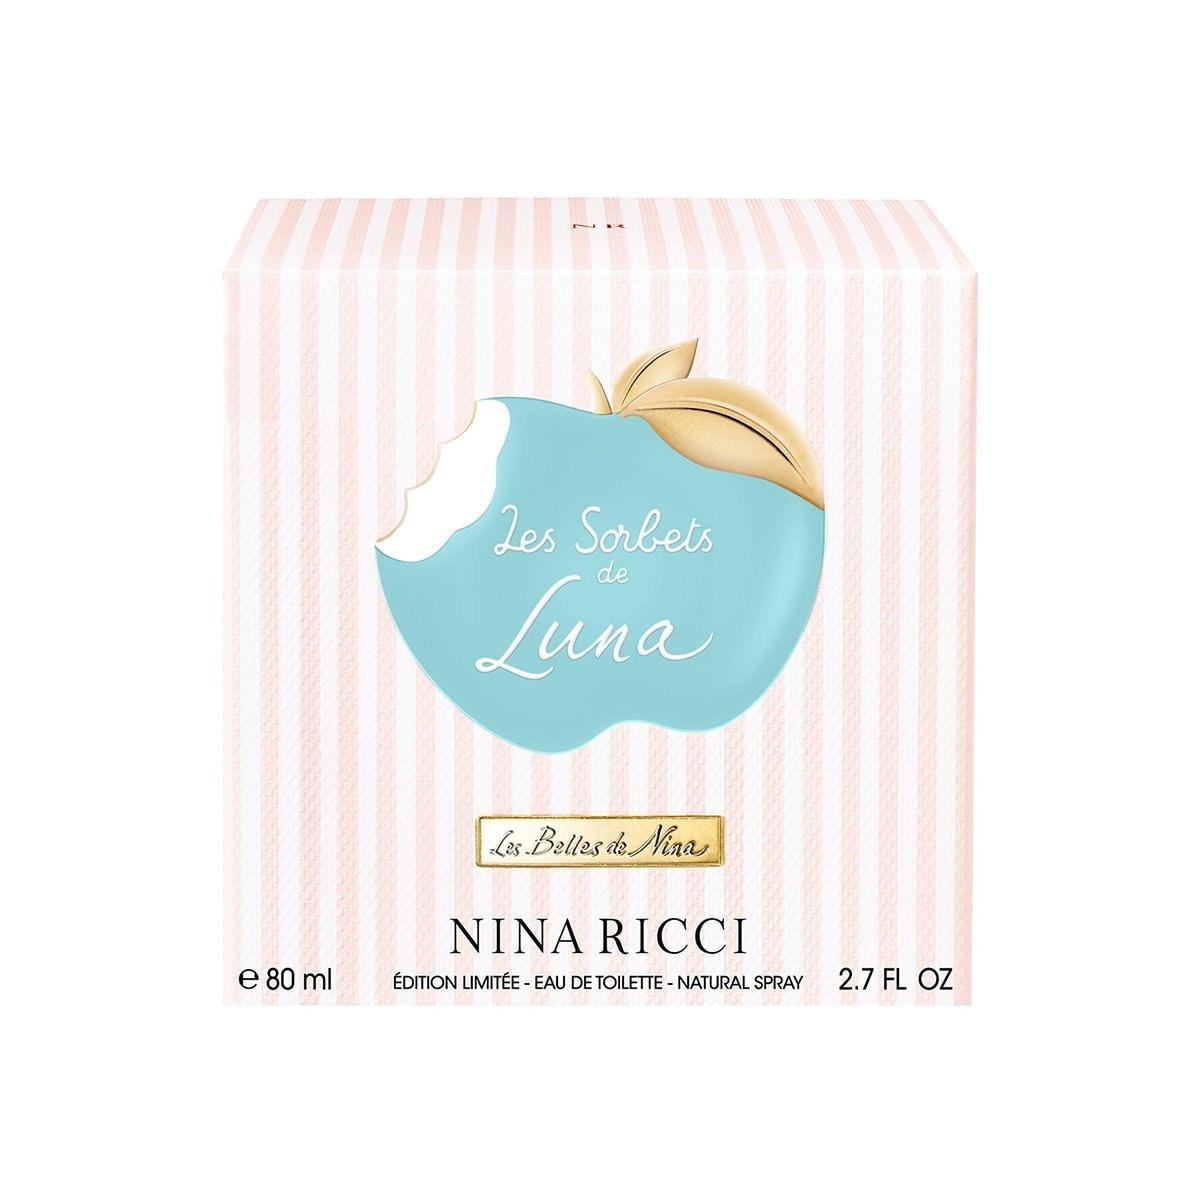 Fragancia para Dama, Nina Ricci Les Sorbets de Luna Edt 80Ml